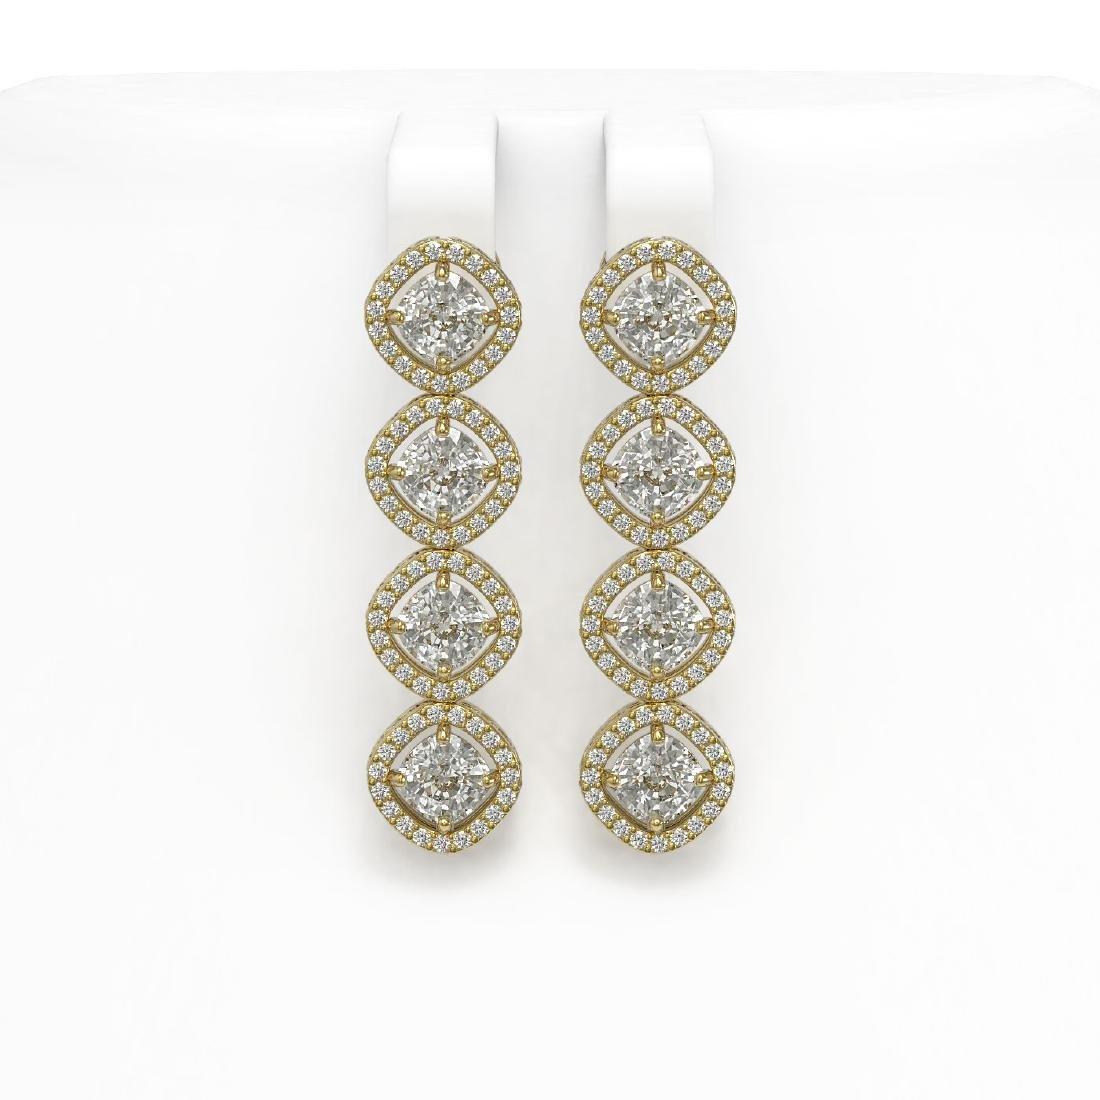 5.85 ctw Cushion Diamond Designer Earrings 18K Yellow